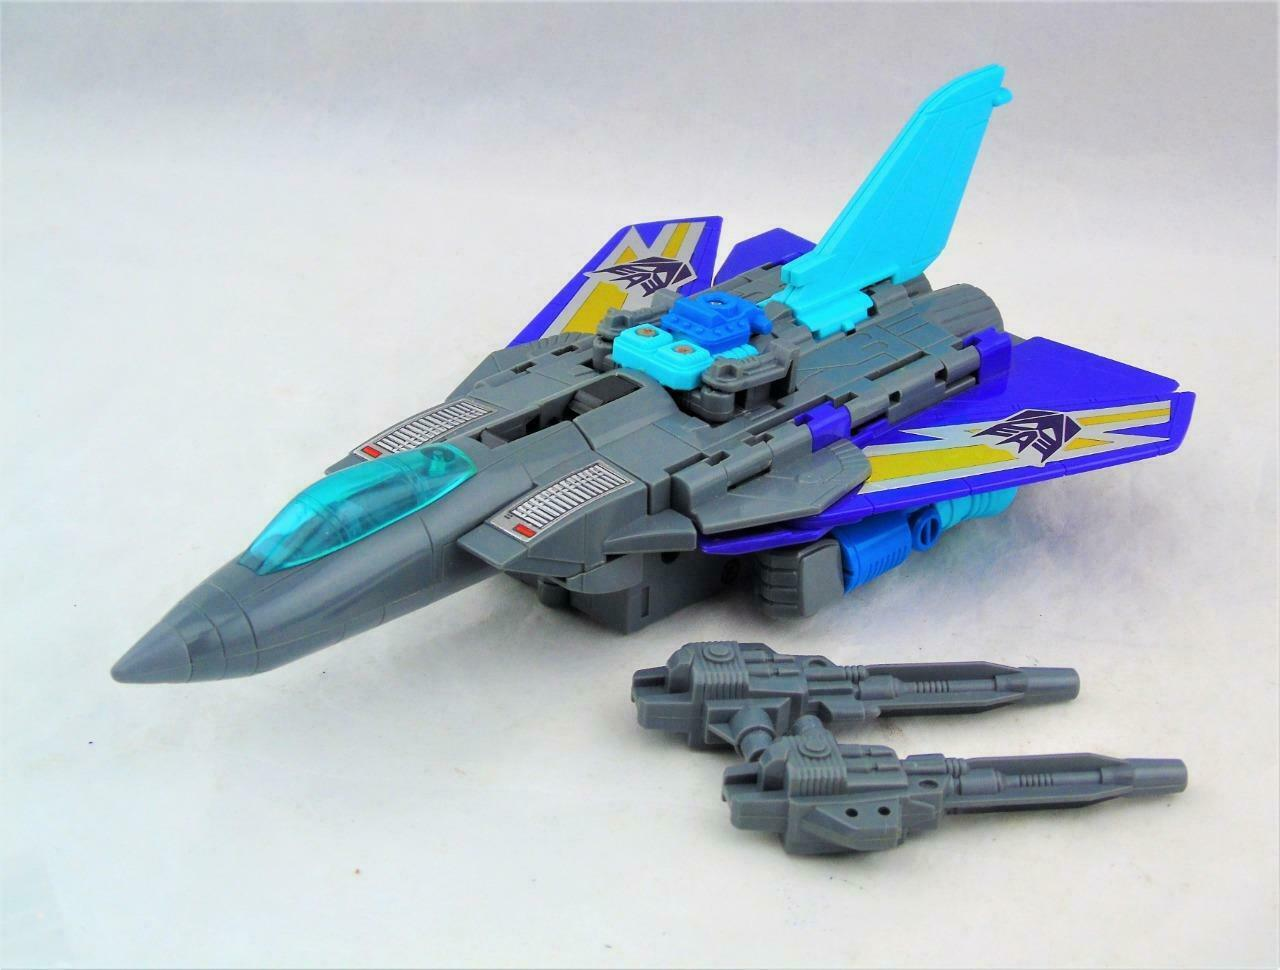 Transformers Original G1 1988 Powermaster Darkwing Completa